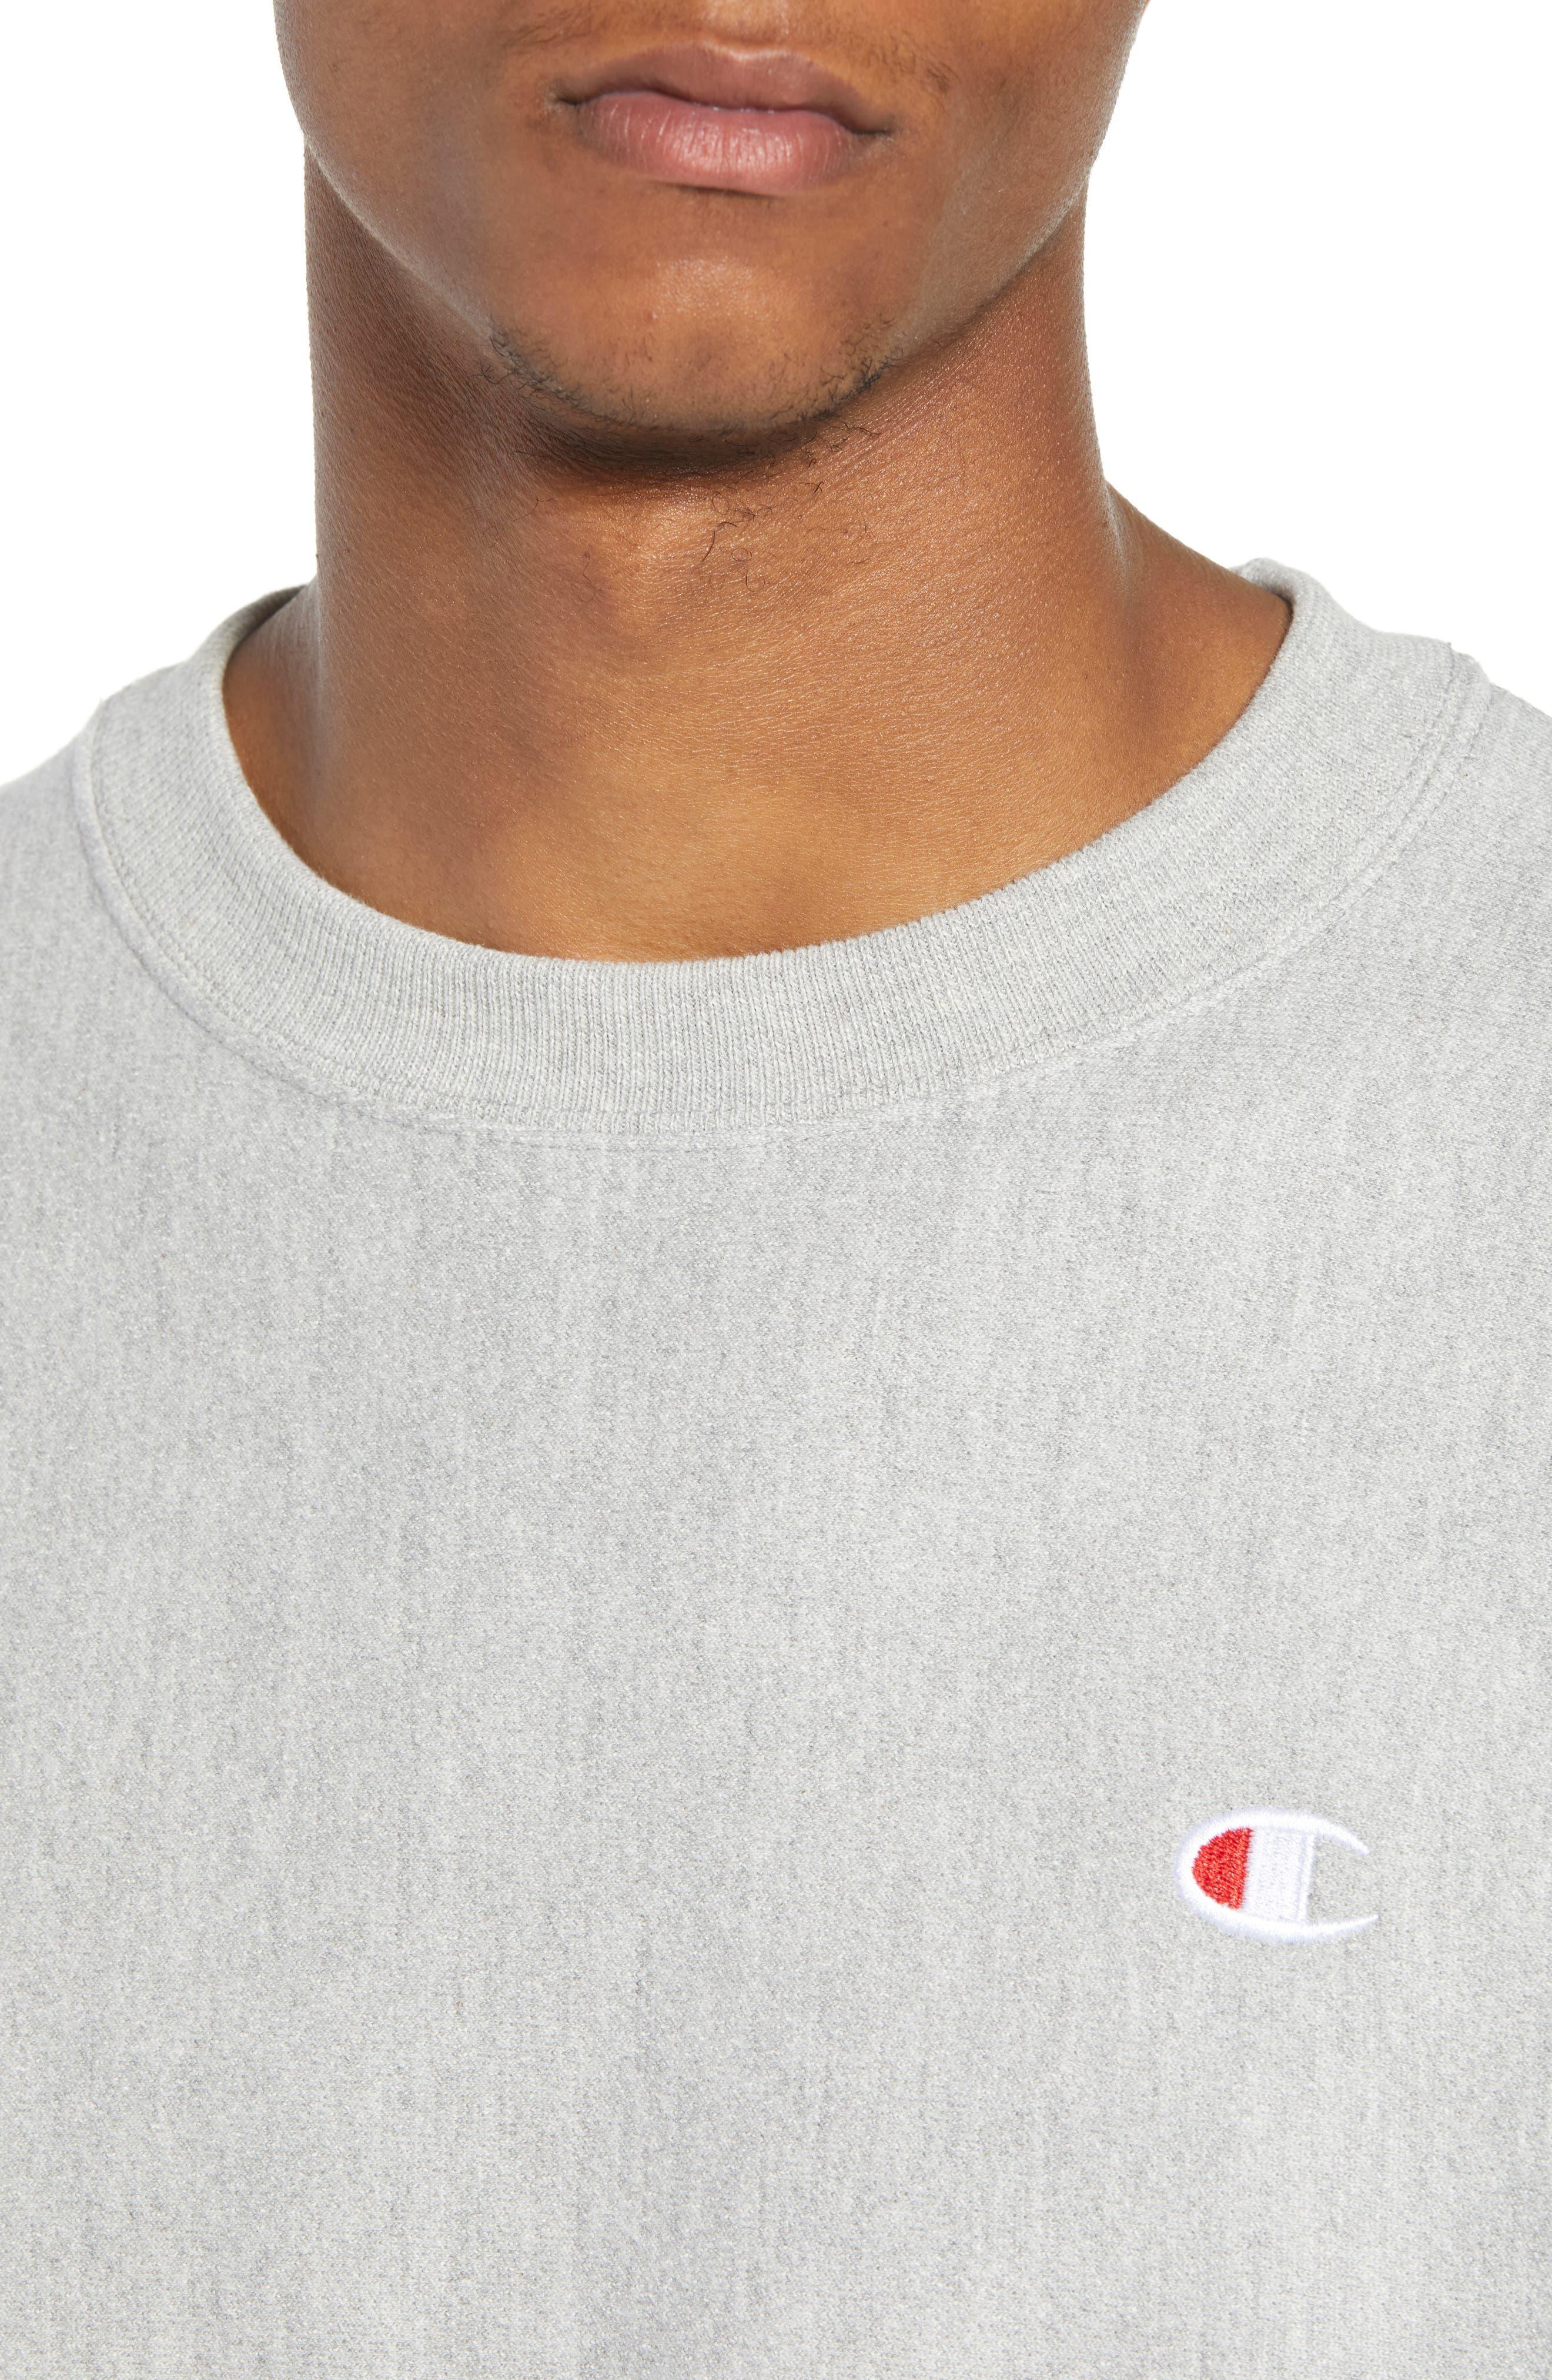 CHAMPION, Reverse Weave Sweatshirt, Alternate thumbnail 4, color, OXFORD GRAY